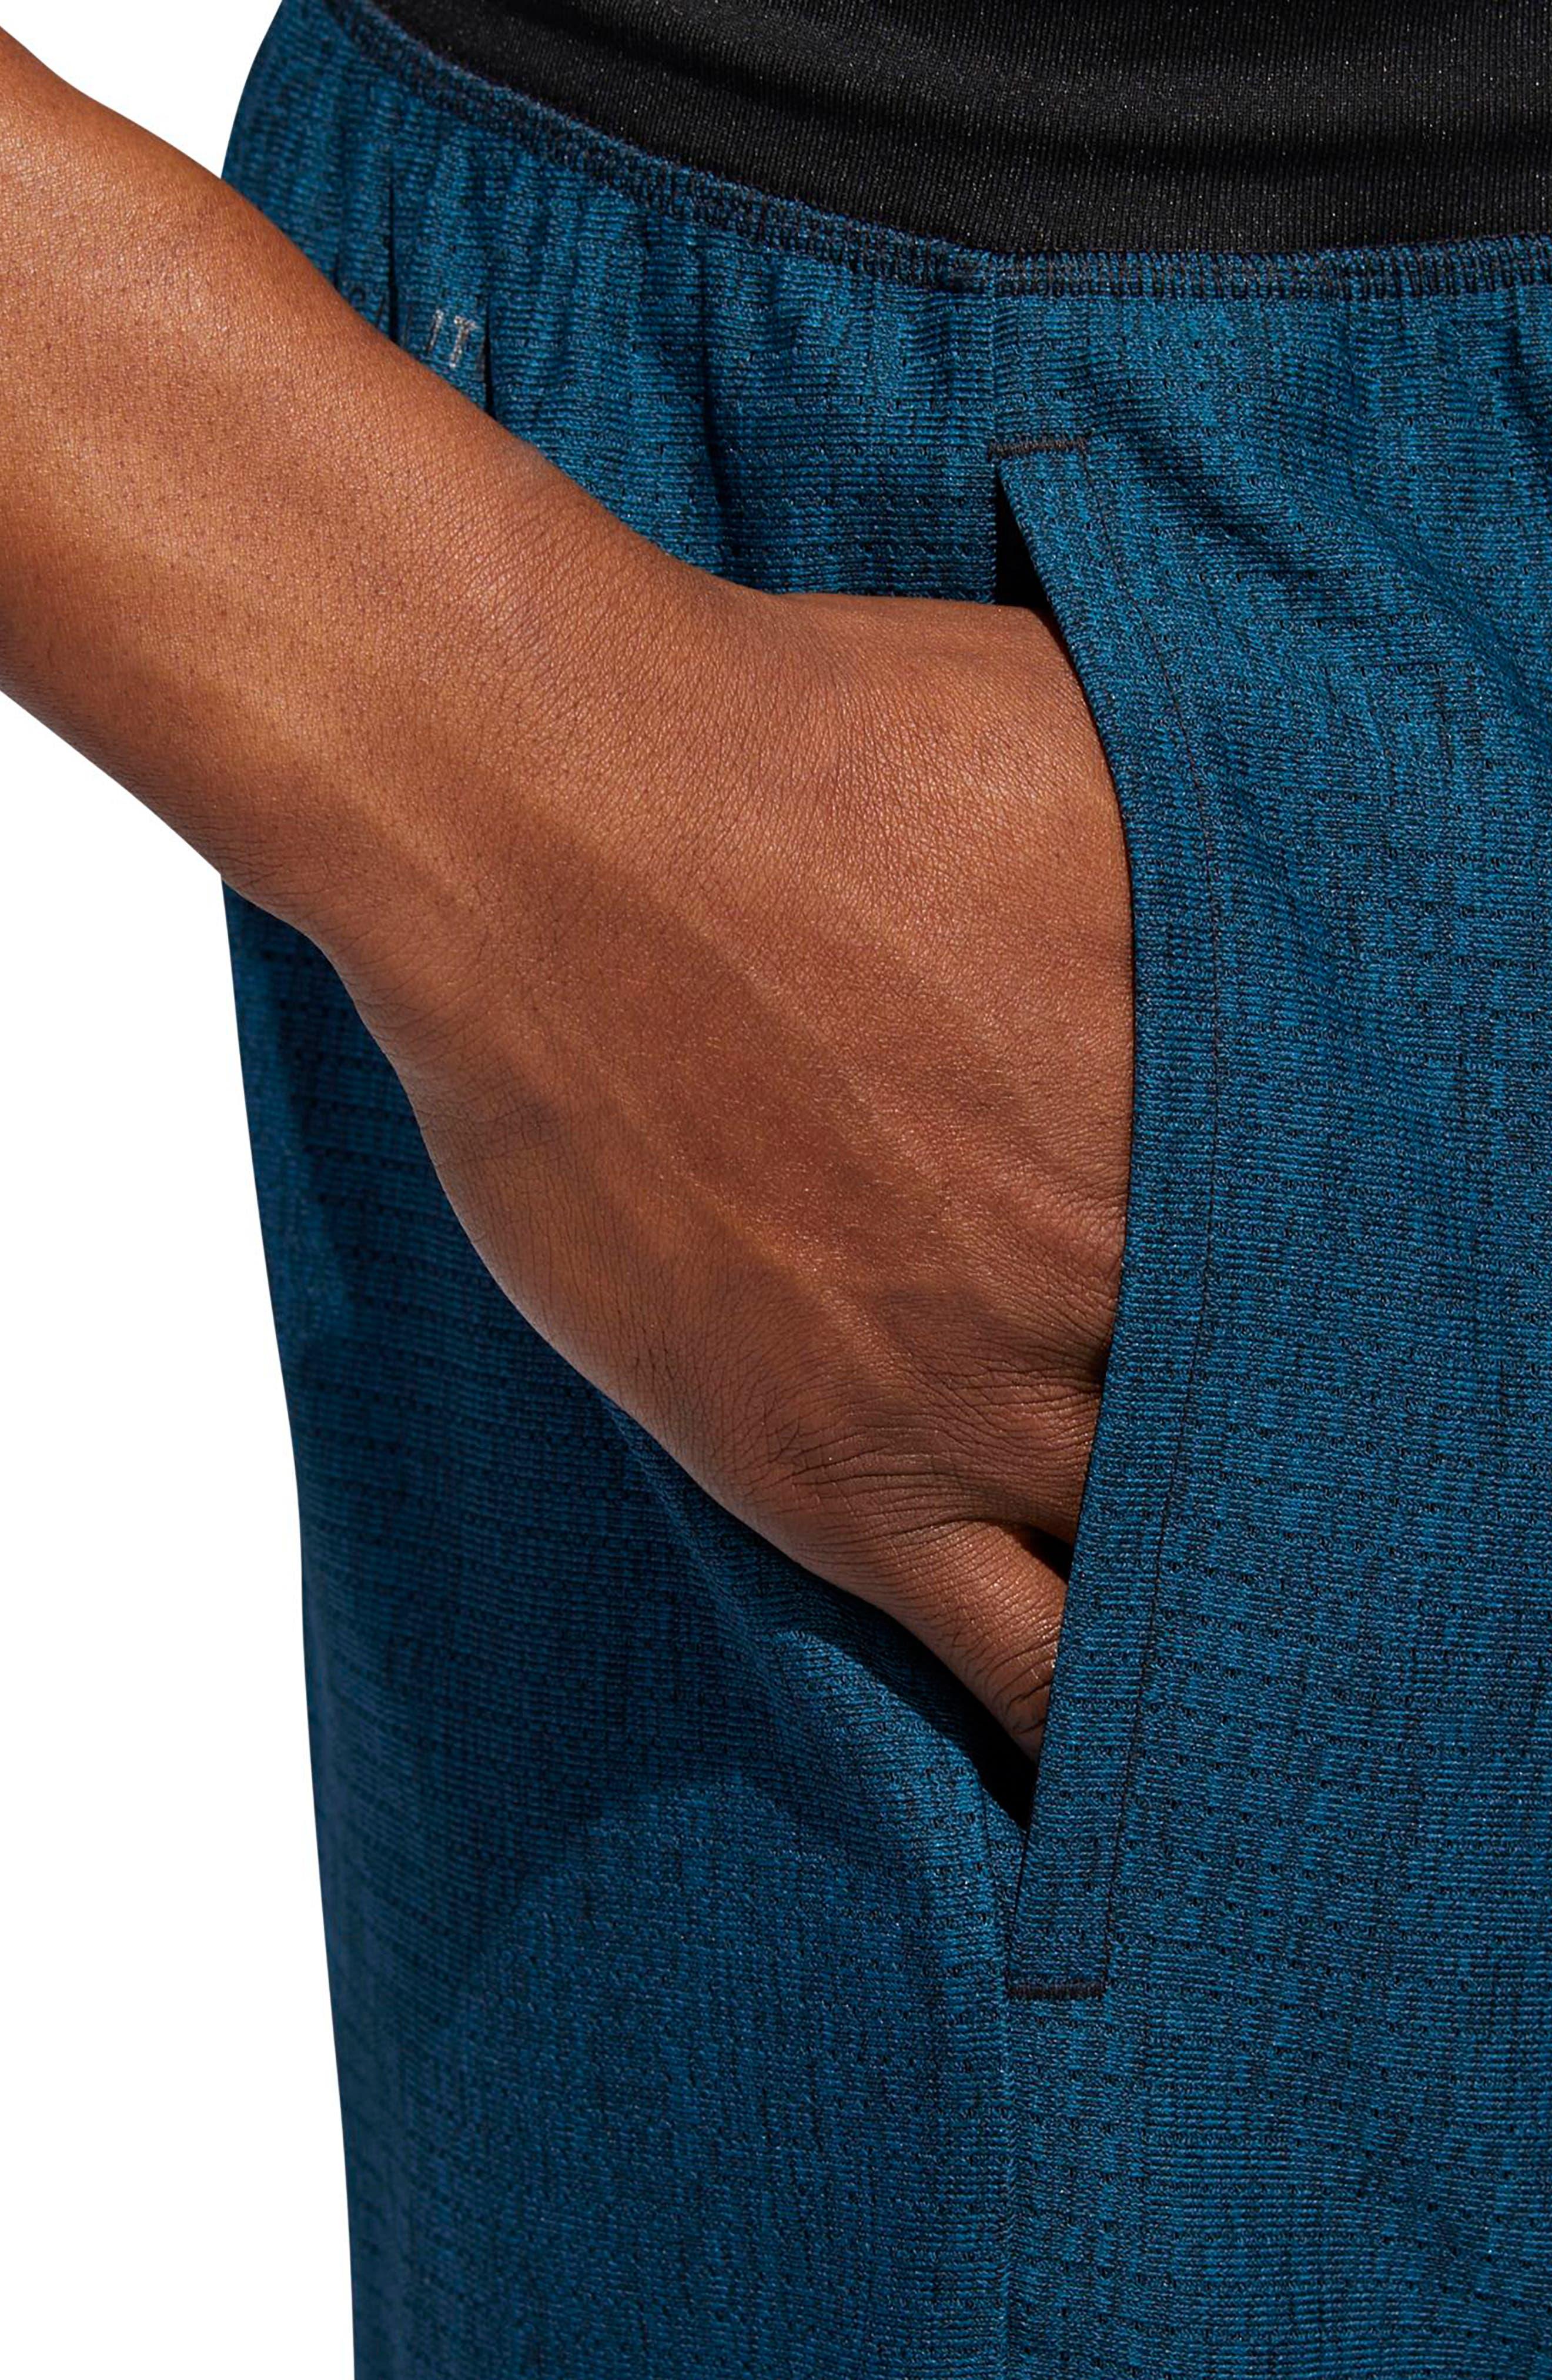 Speedbreaker Shorts,                             Alternate thumbnail 4, color,                             Real Teal